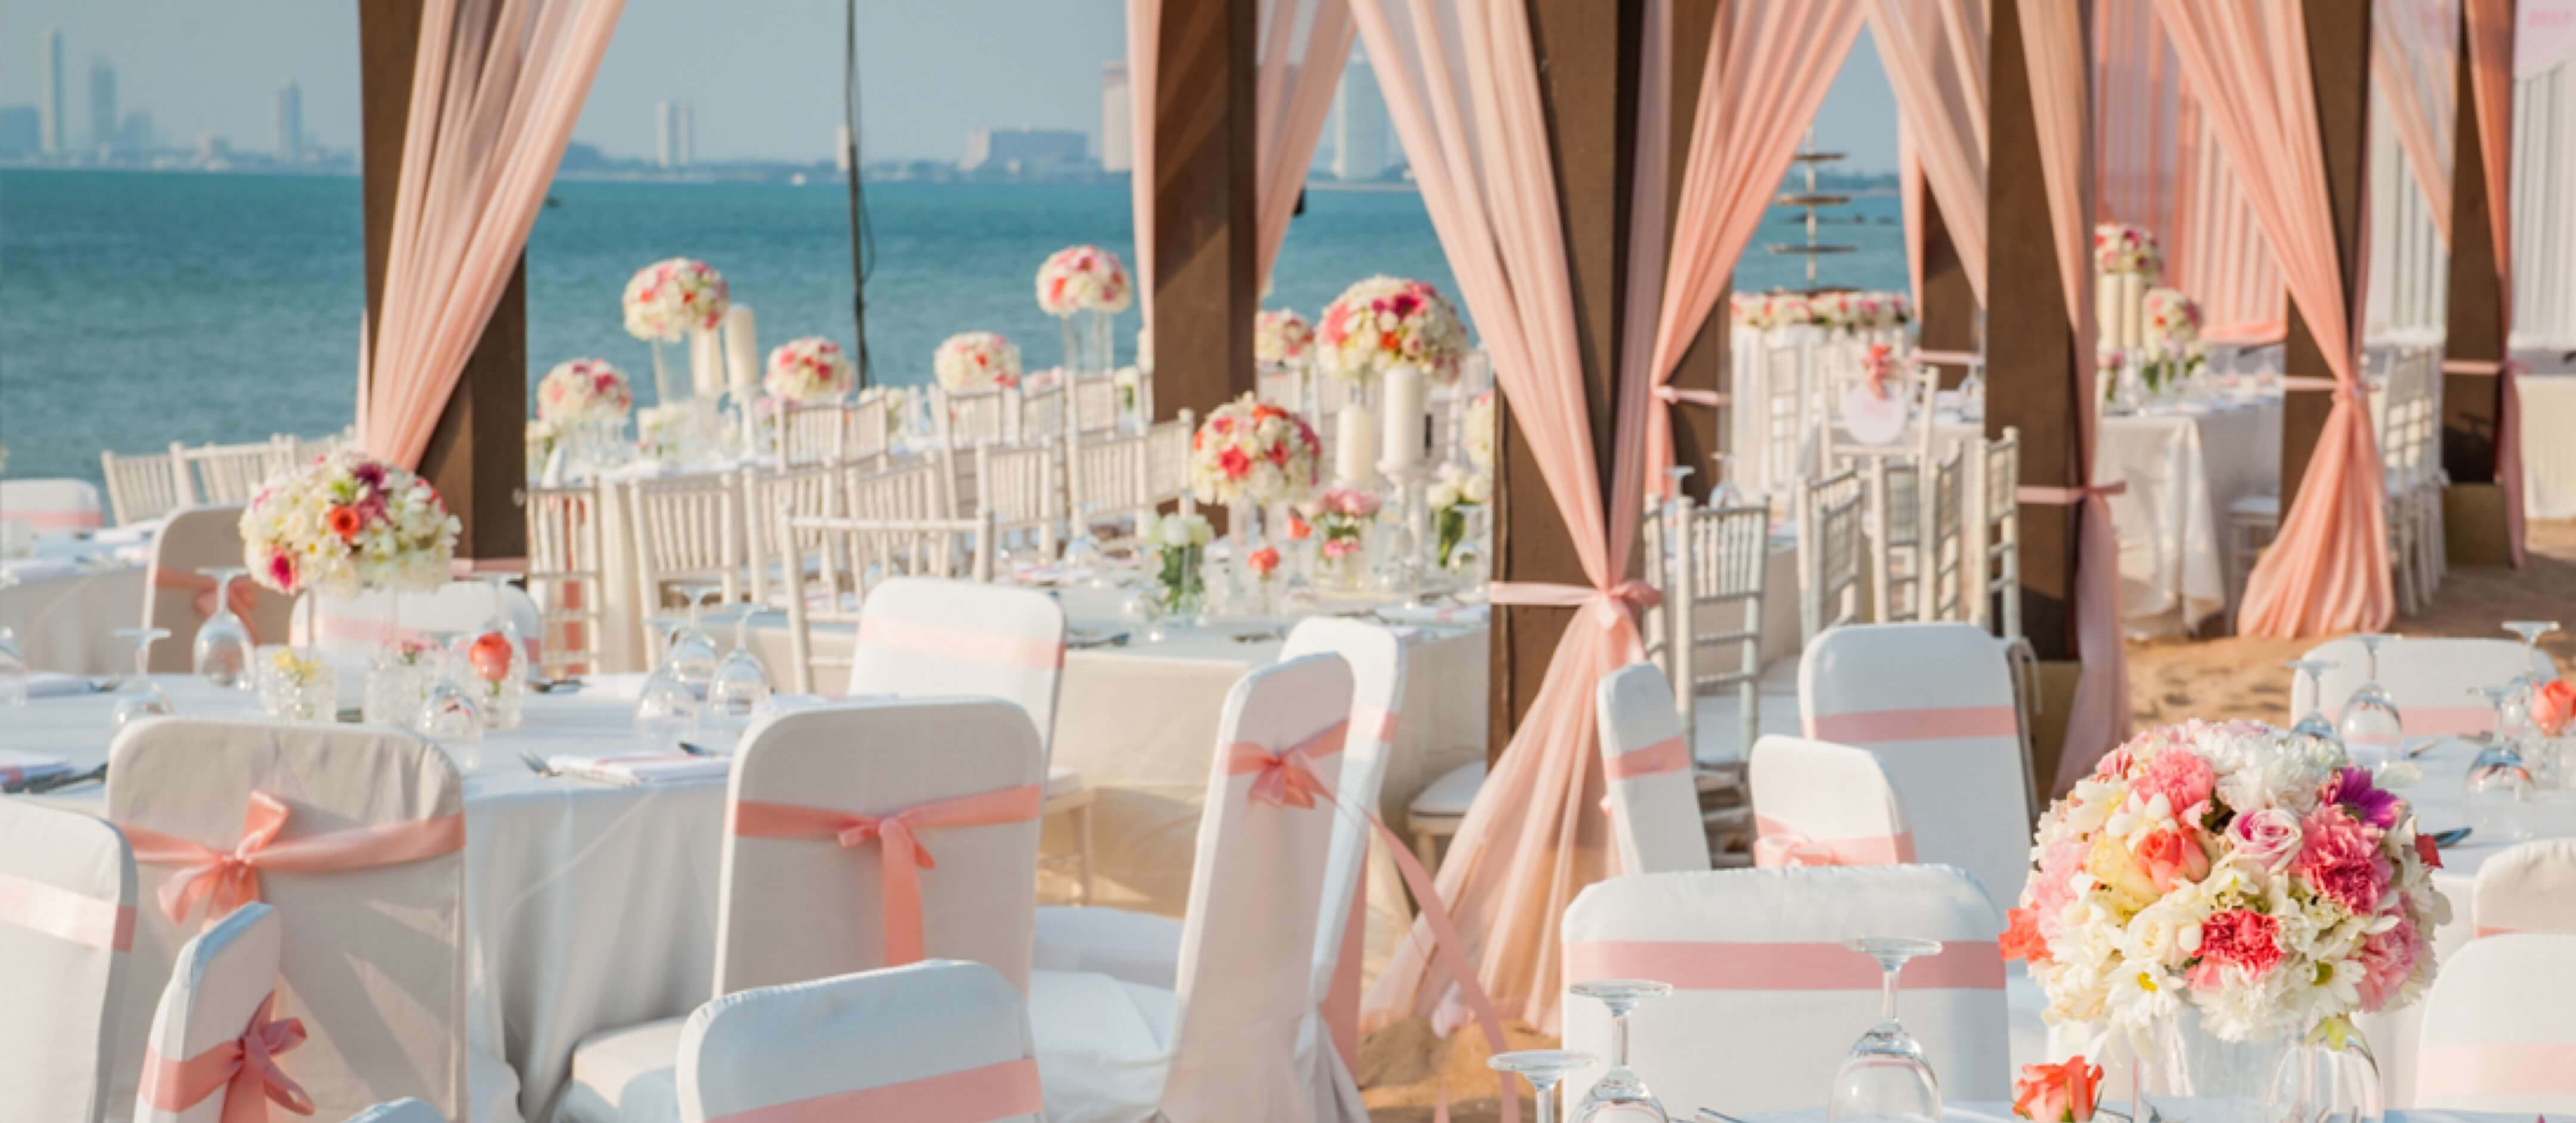 Wedding Florists & Decorators